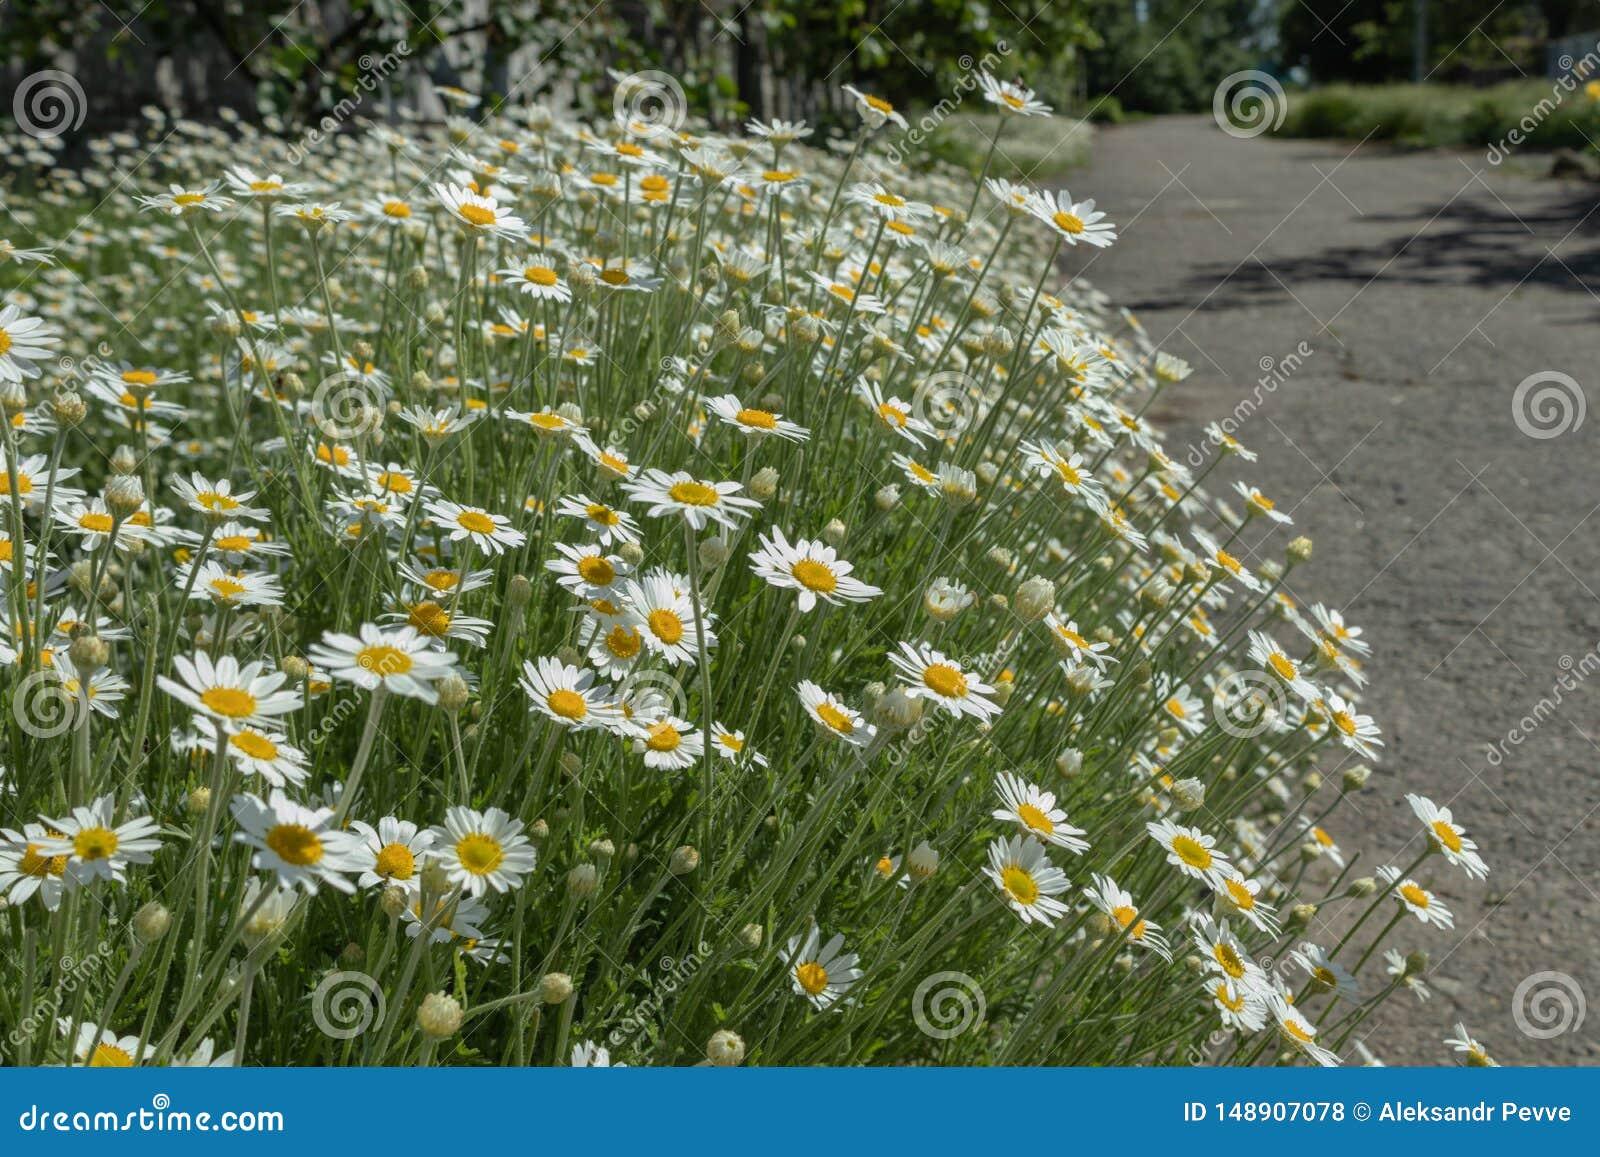 A large bush of blooming daisies near an asphalt road